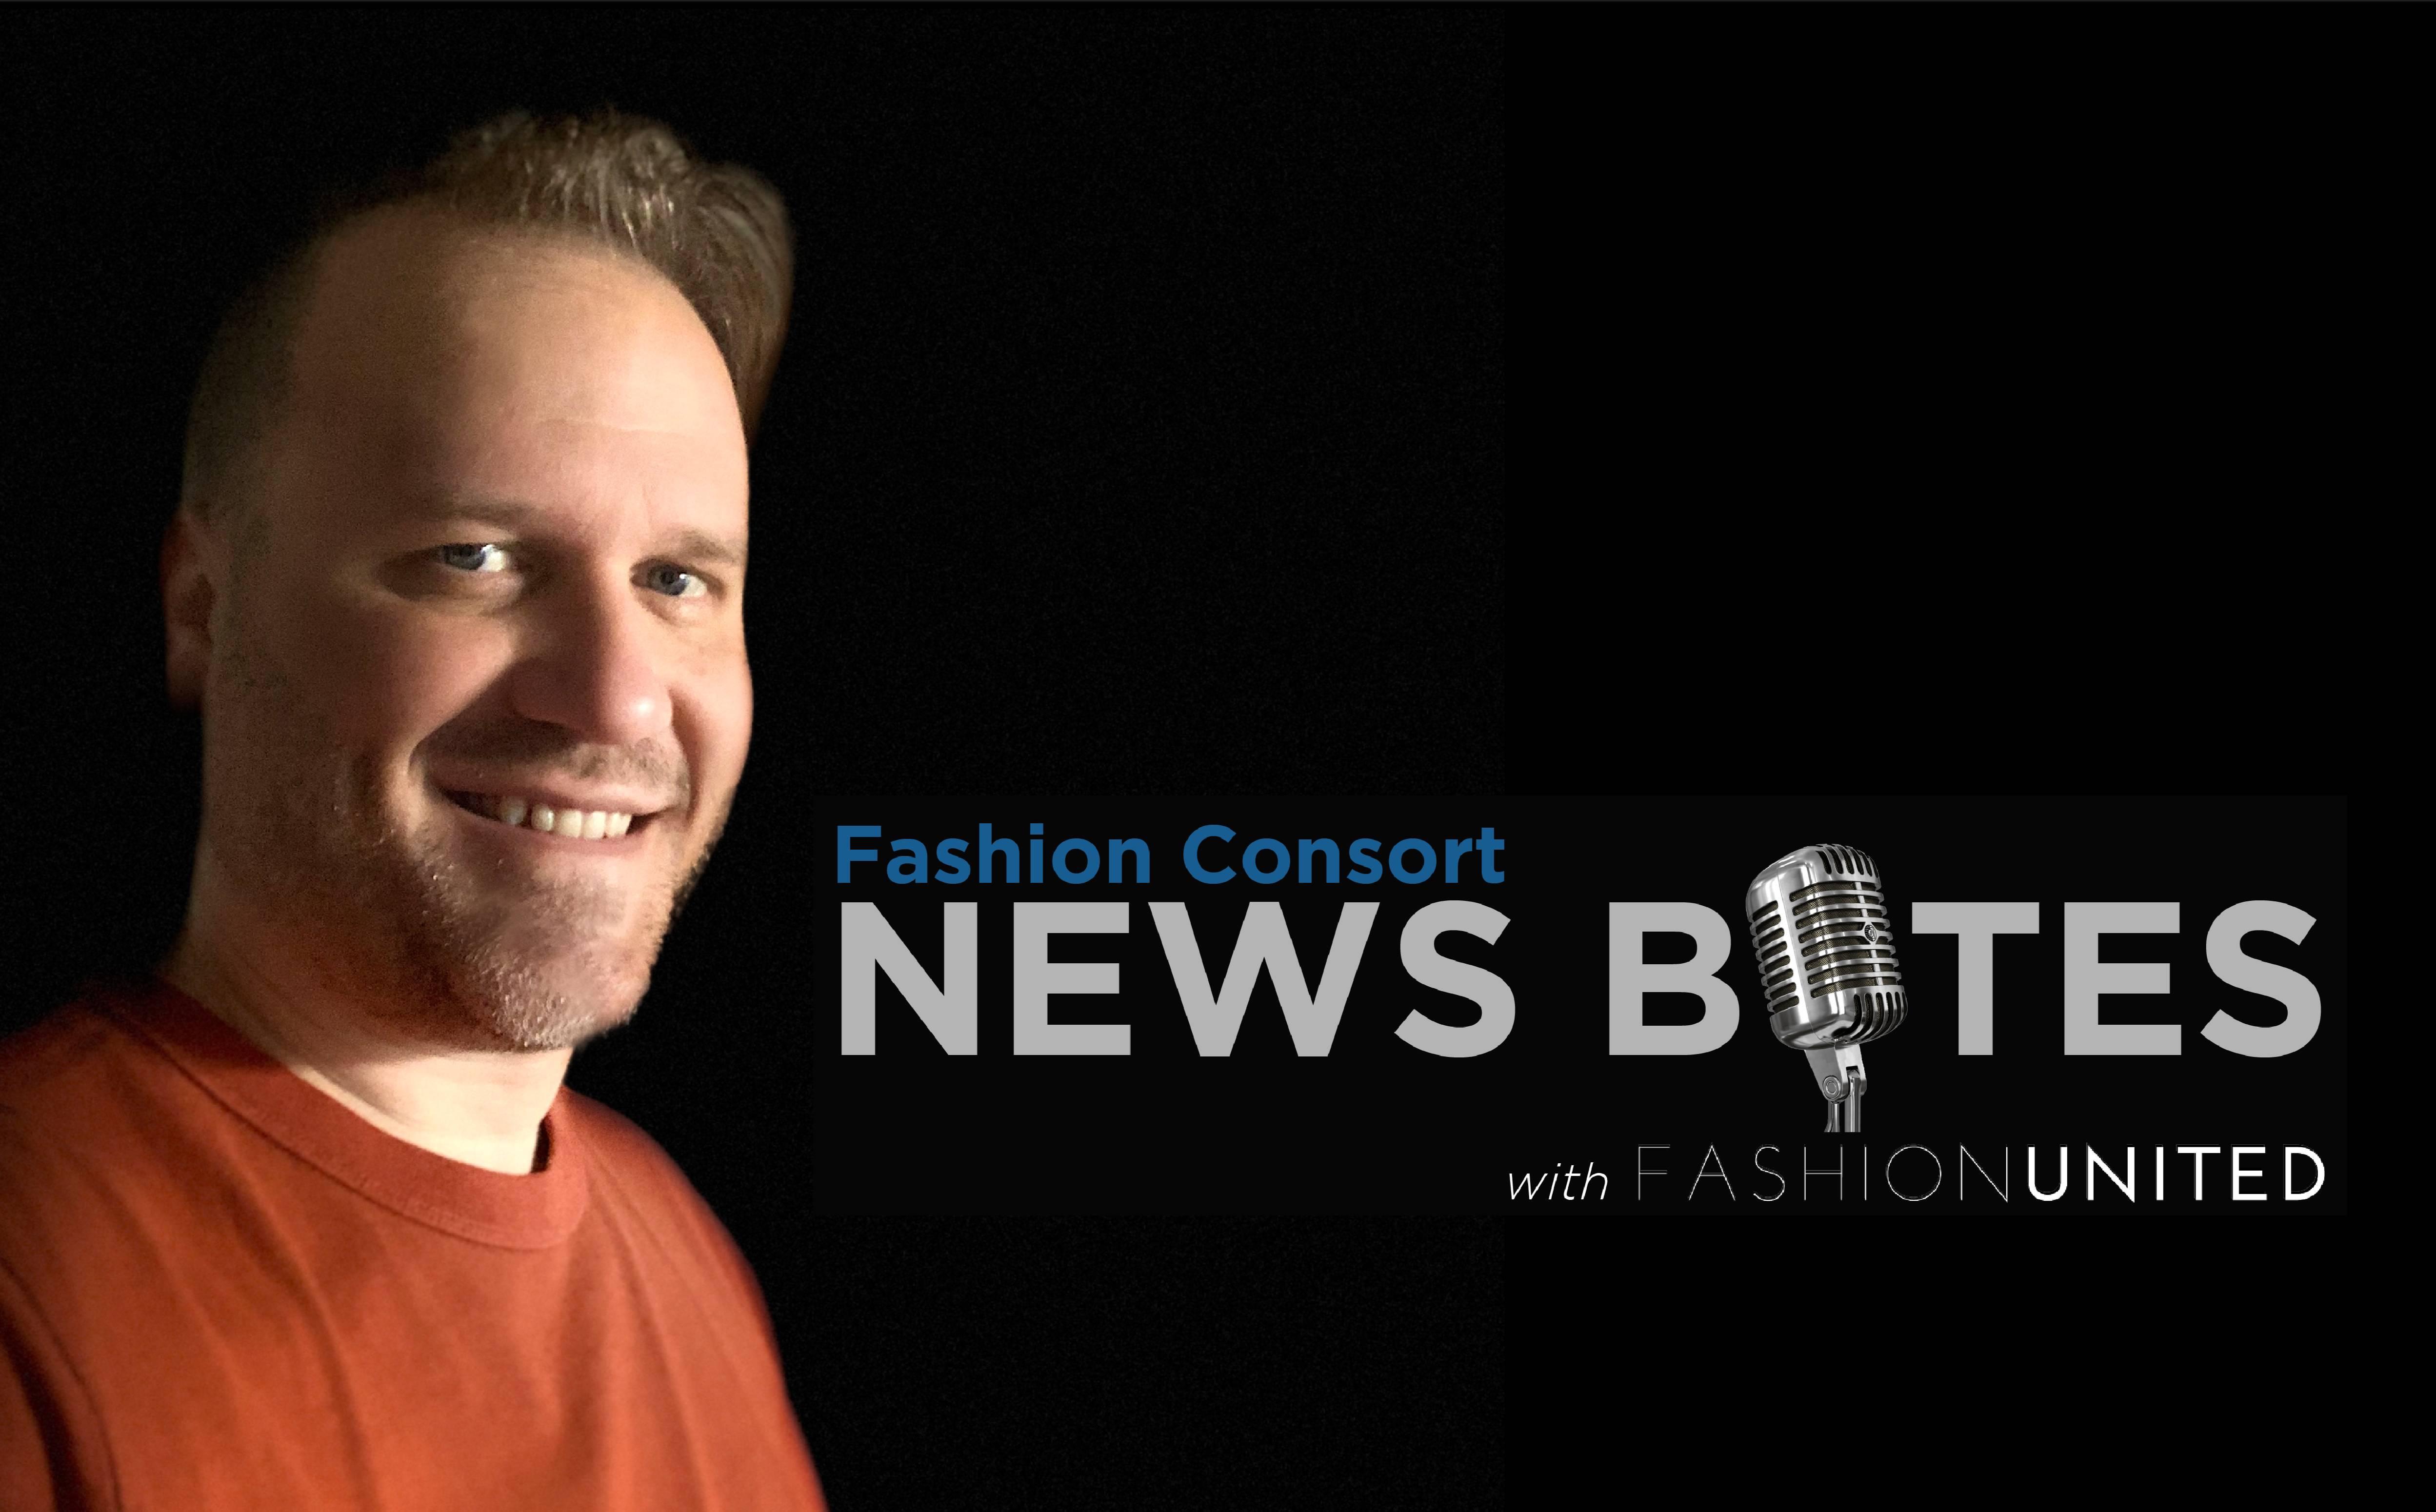 Fashion Leadership Requires Vision and Skills